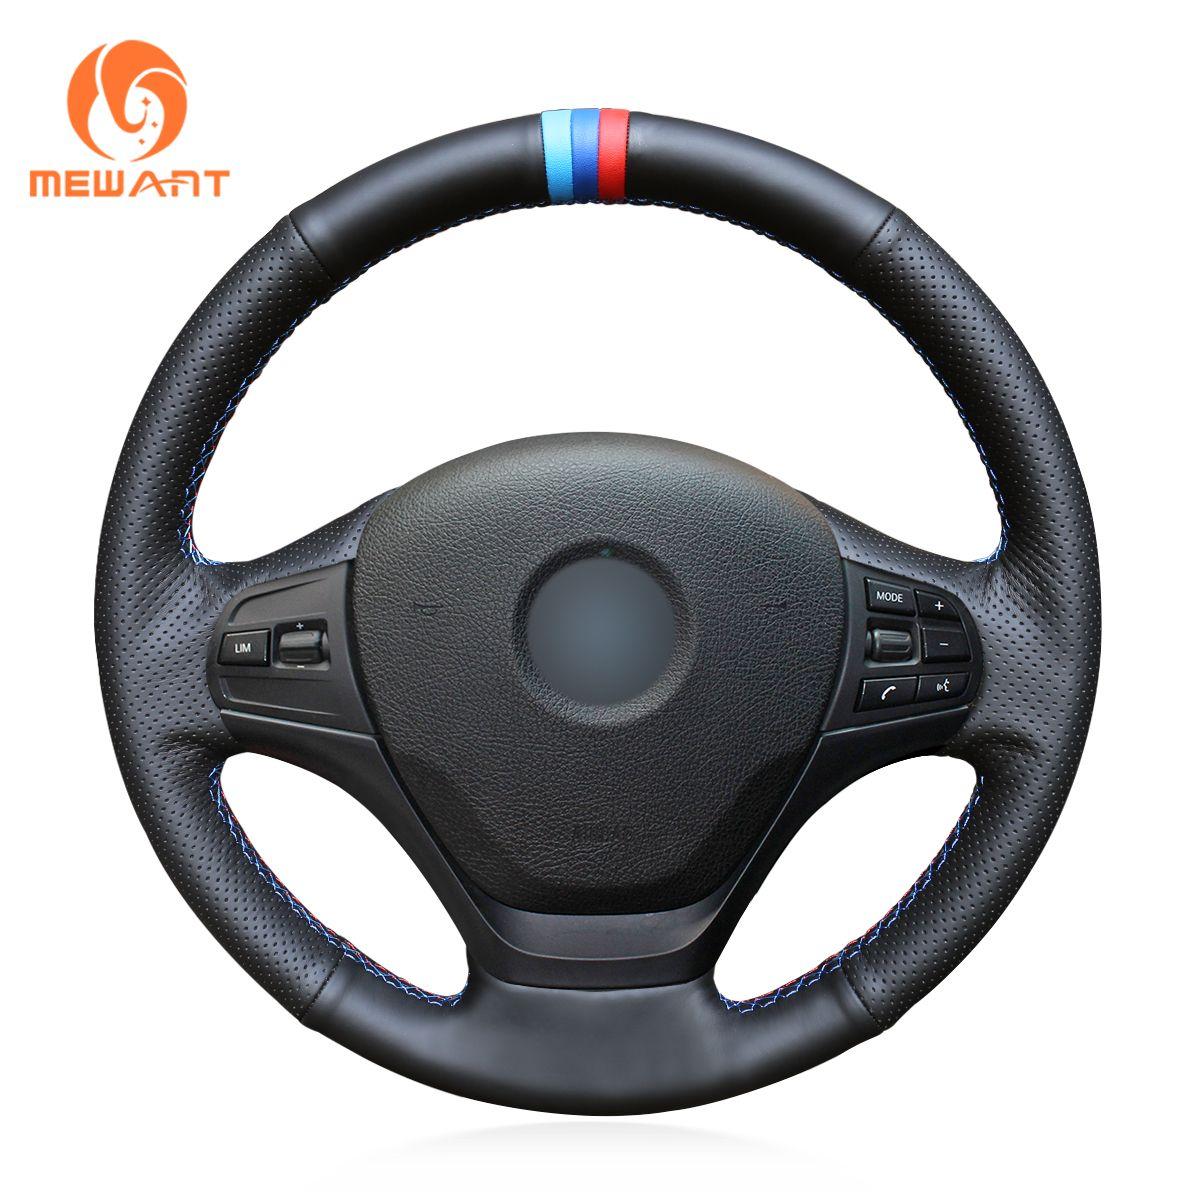 MEWANT Black Genuine Leather Hand Sew Car Steering Wheel Cover for BMW F30 316i 320i 328i